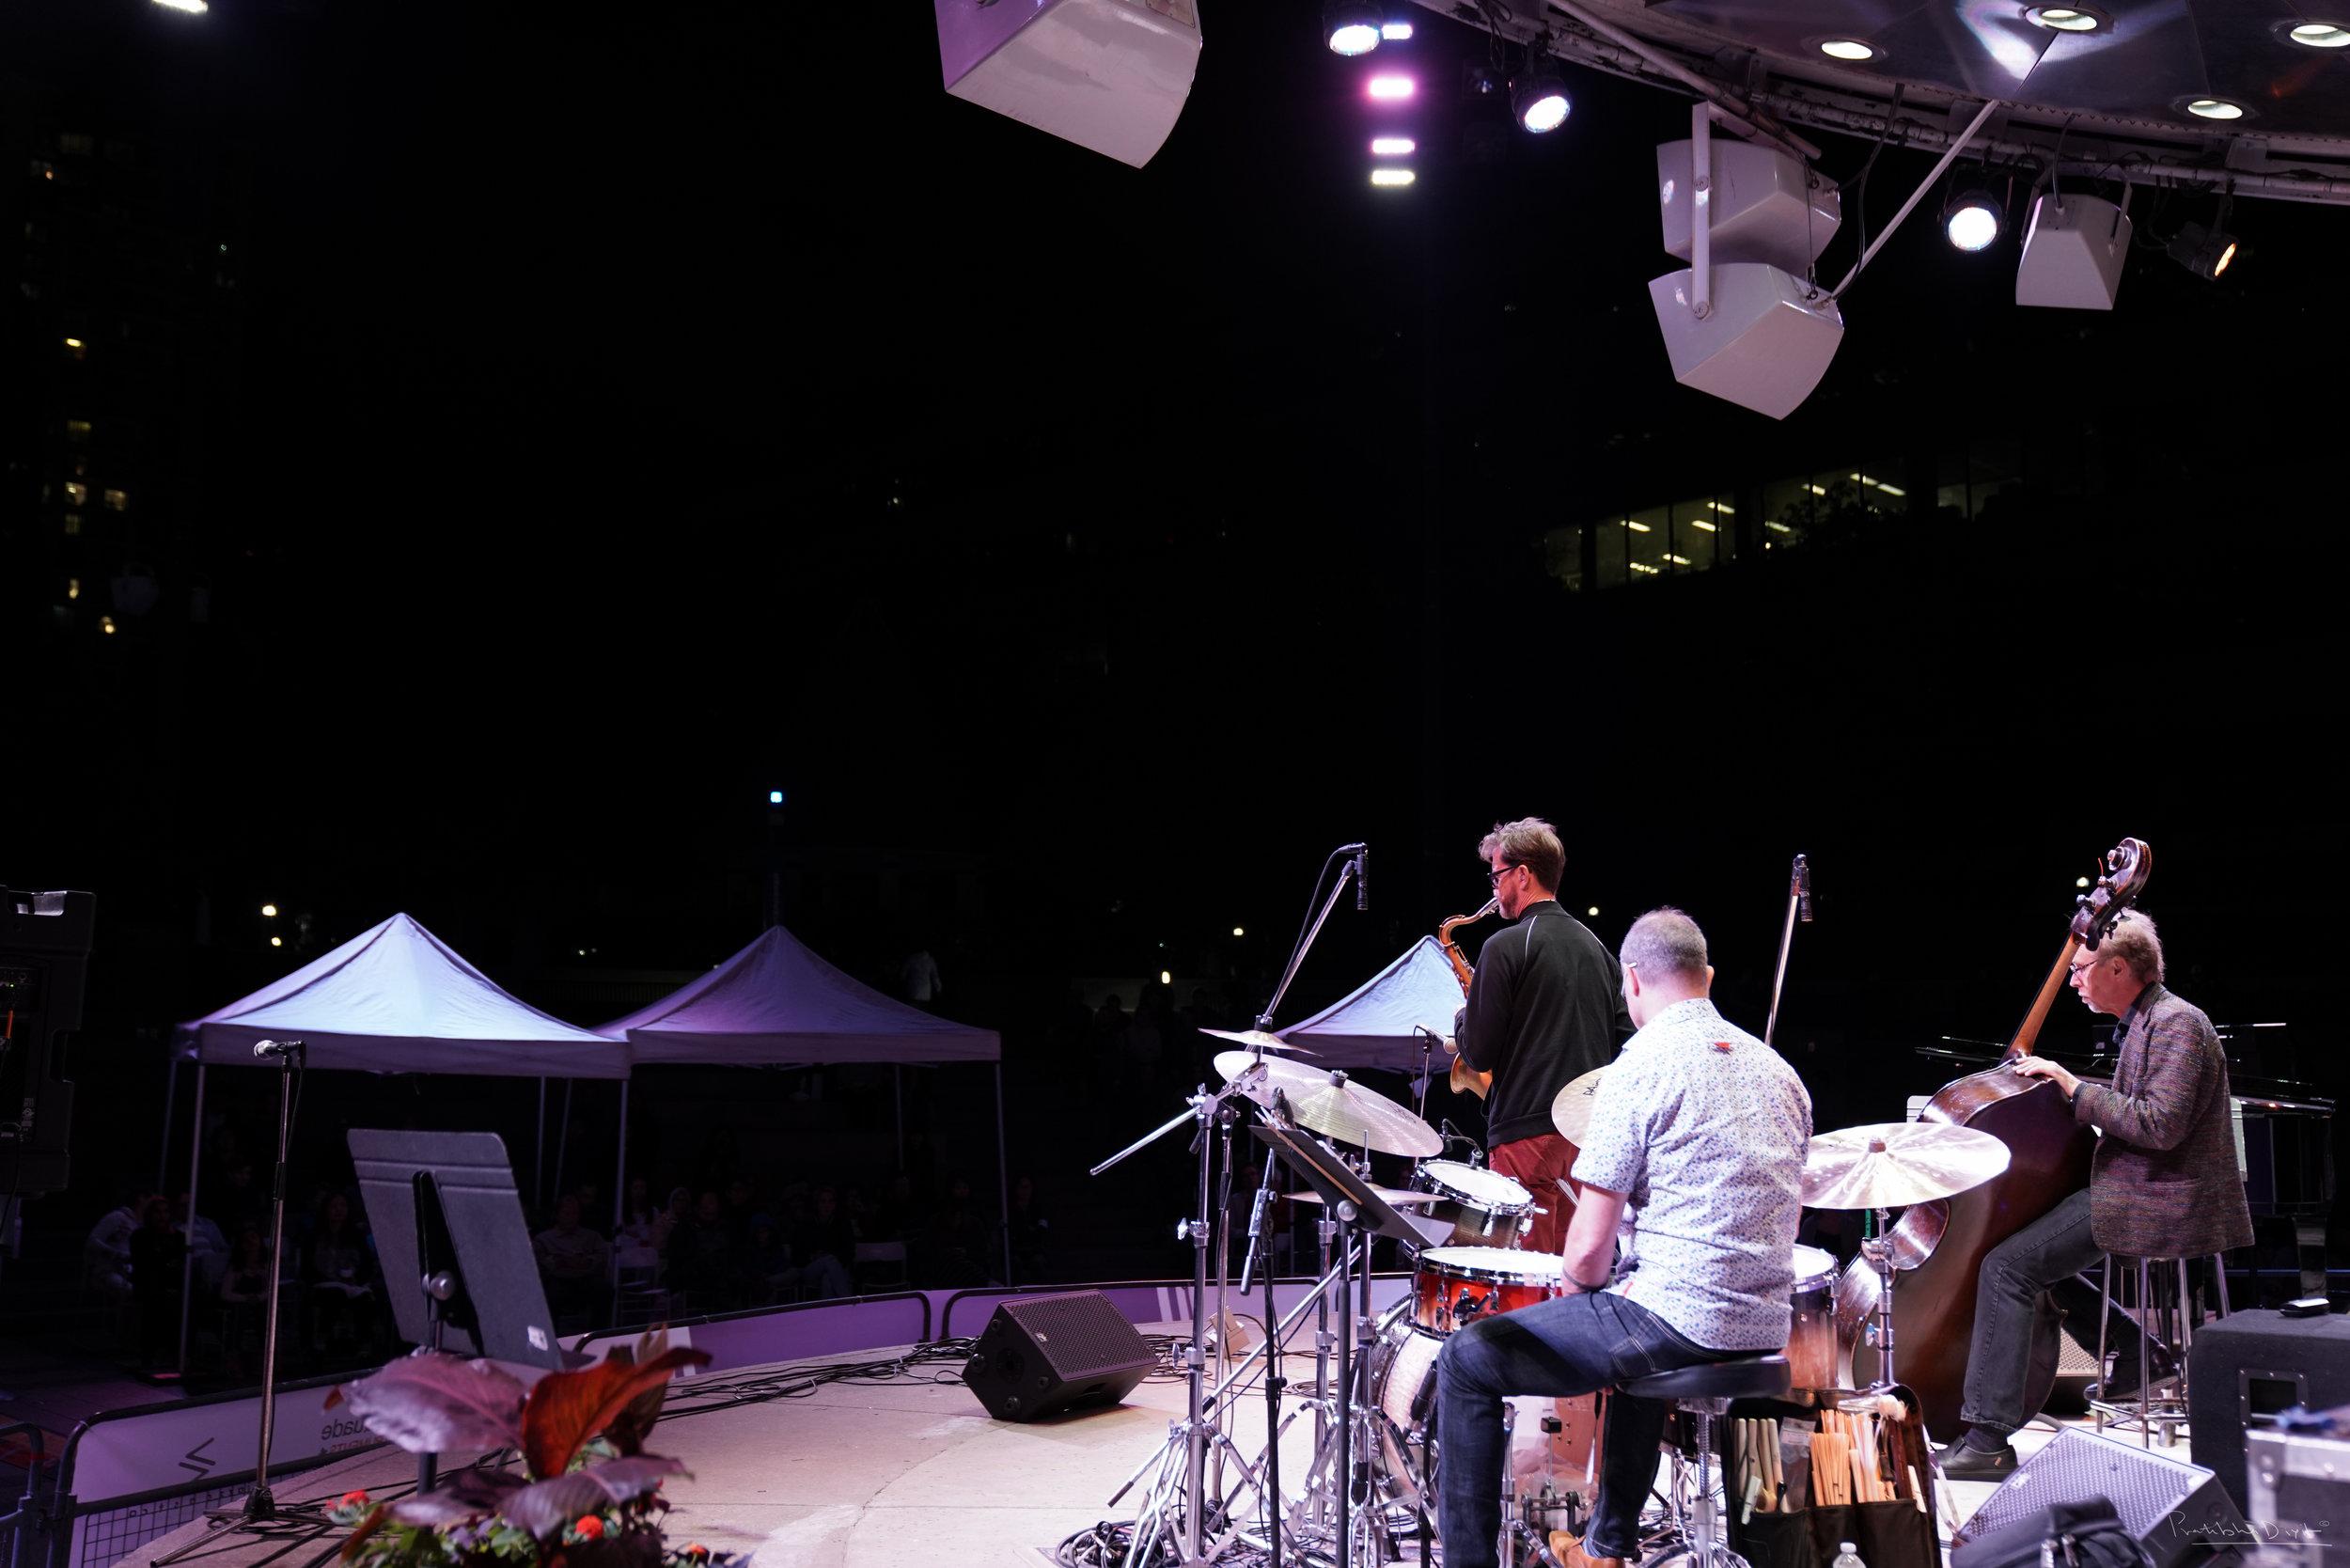 2019 Donny McCaslin Concert-Donny trio 4 main.jpg